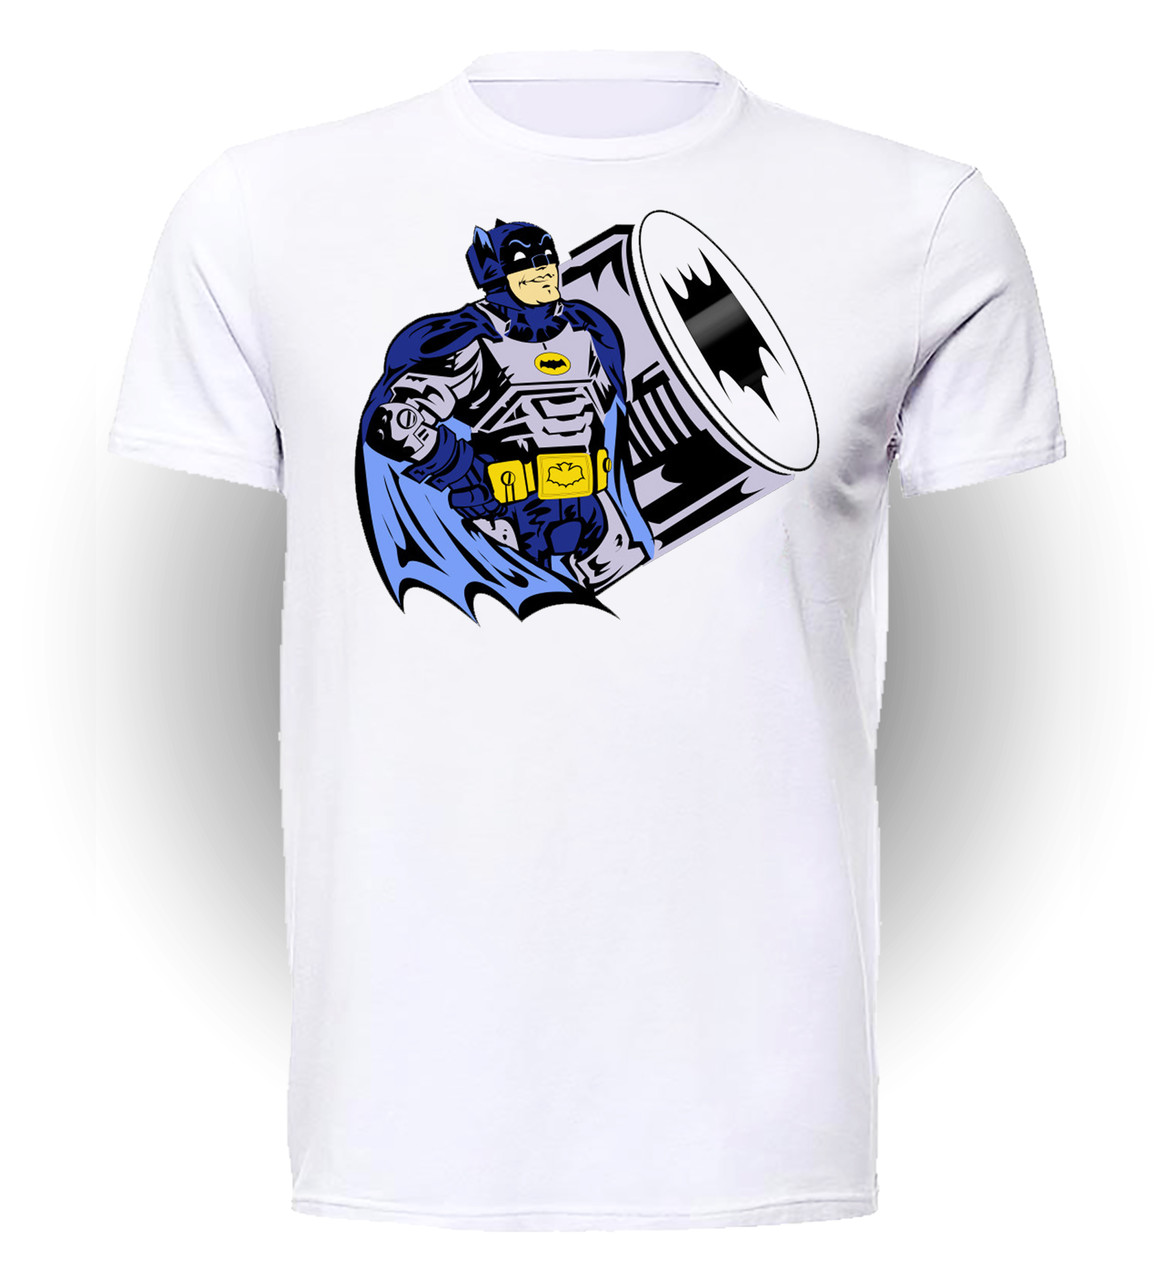 Футболка GeekLand Бэтмен Batman прожектор BM.01.053